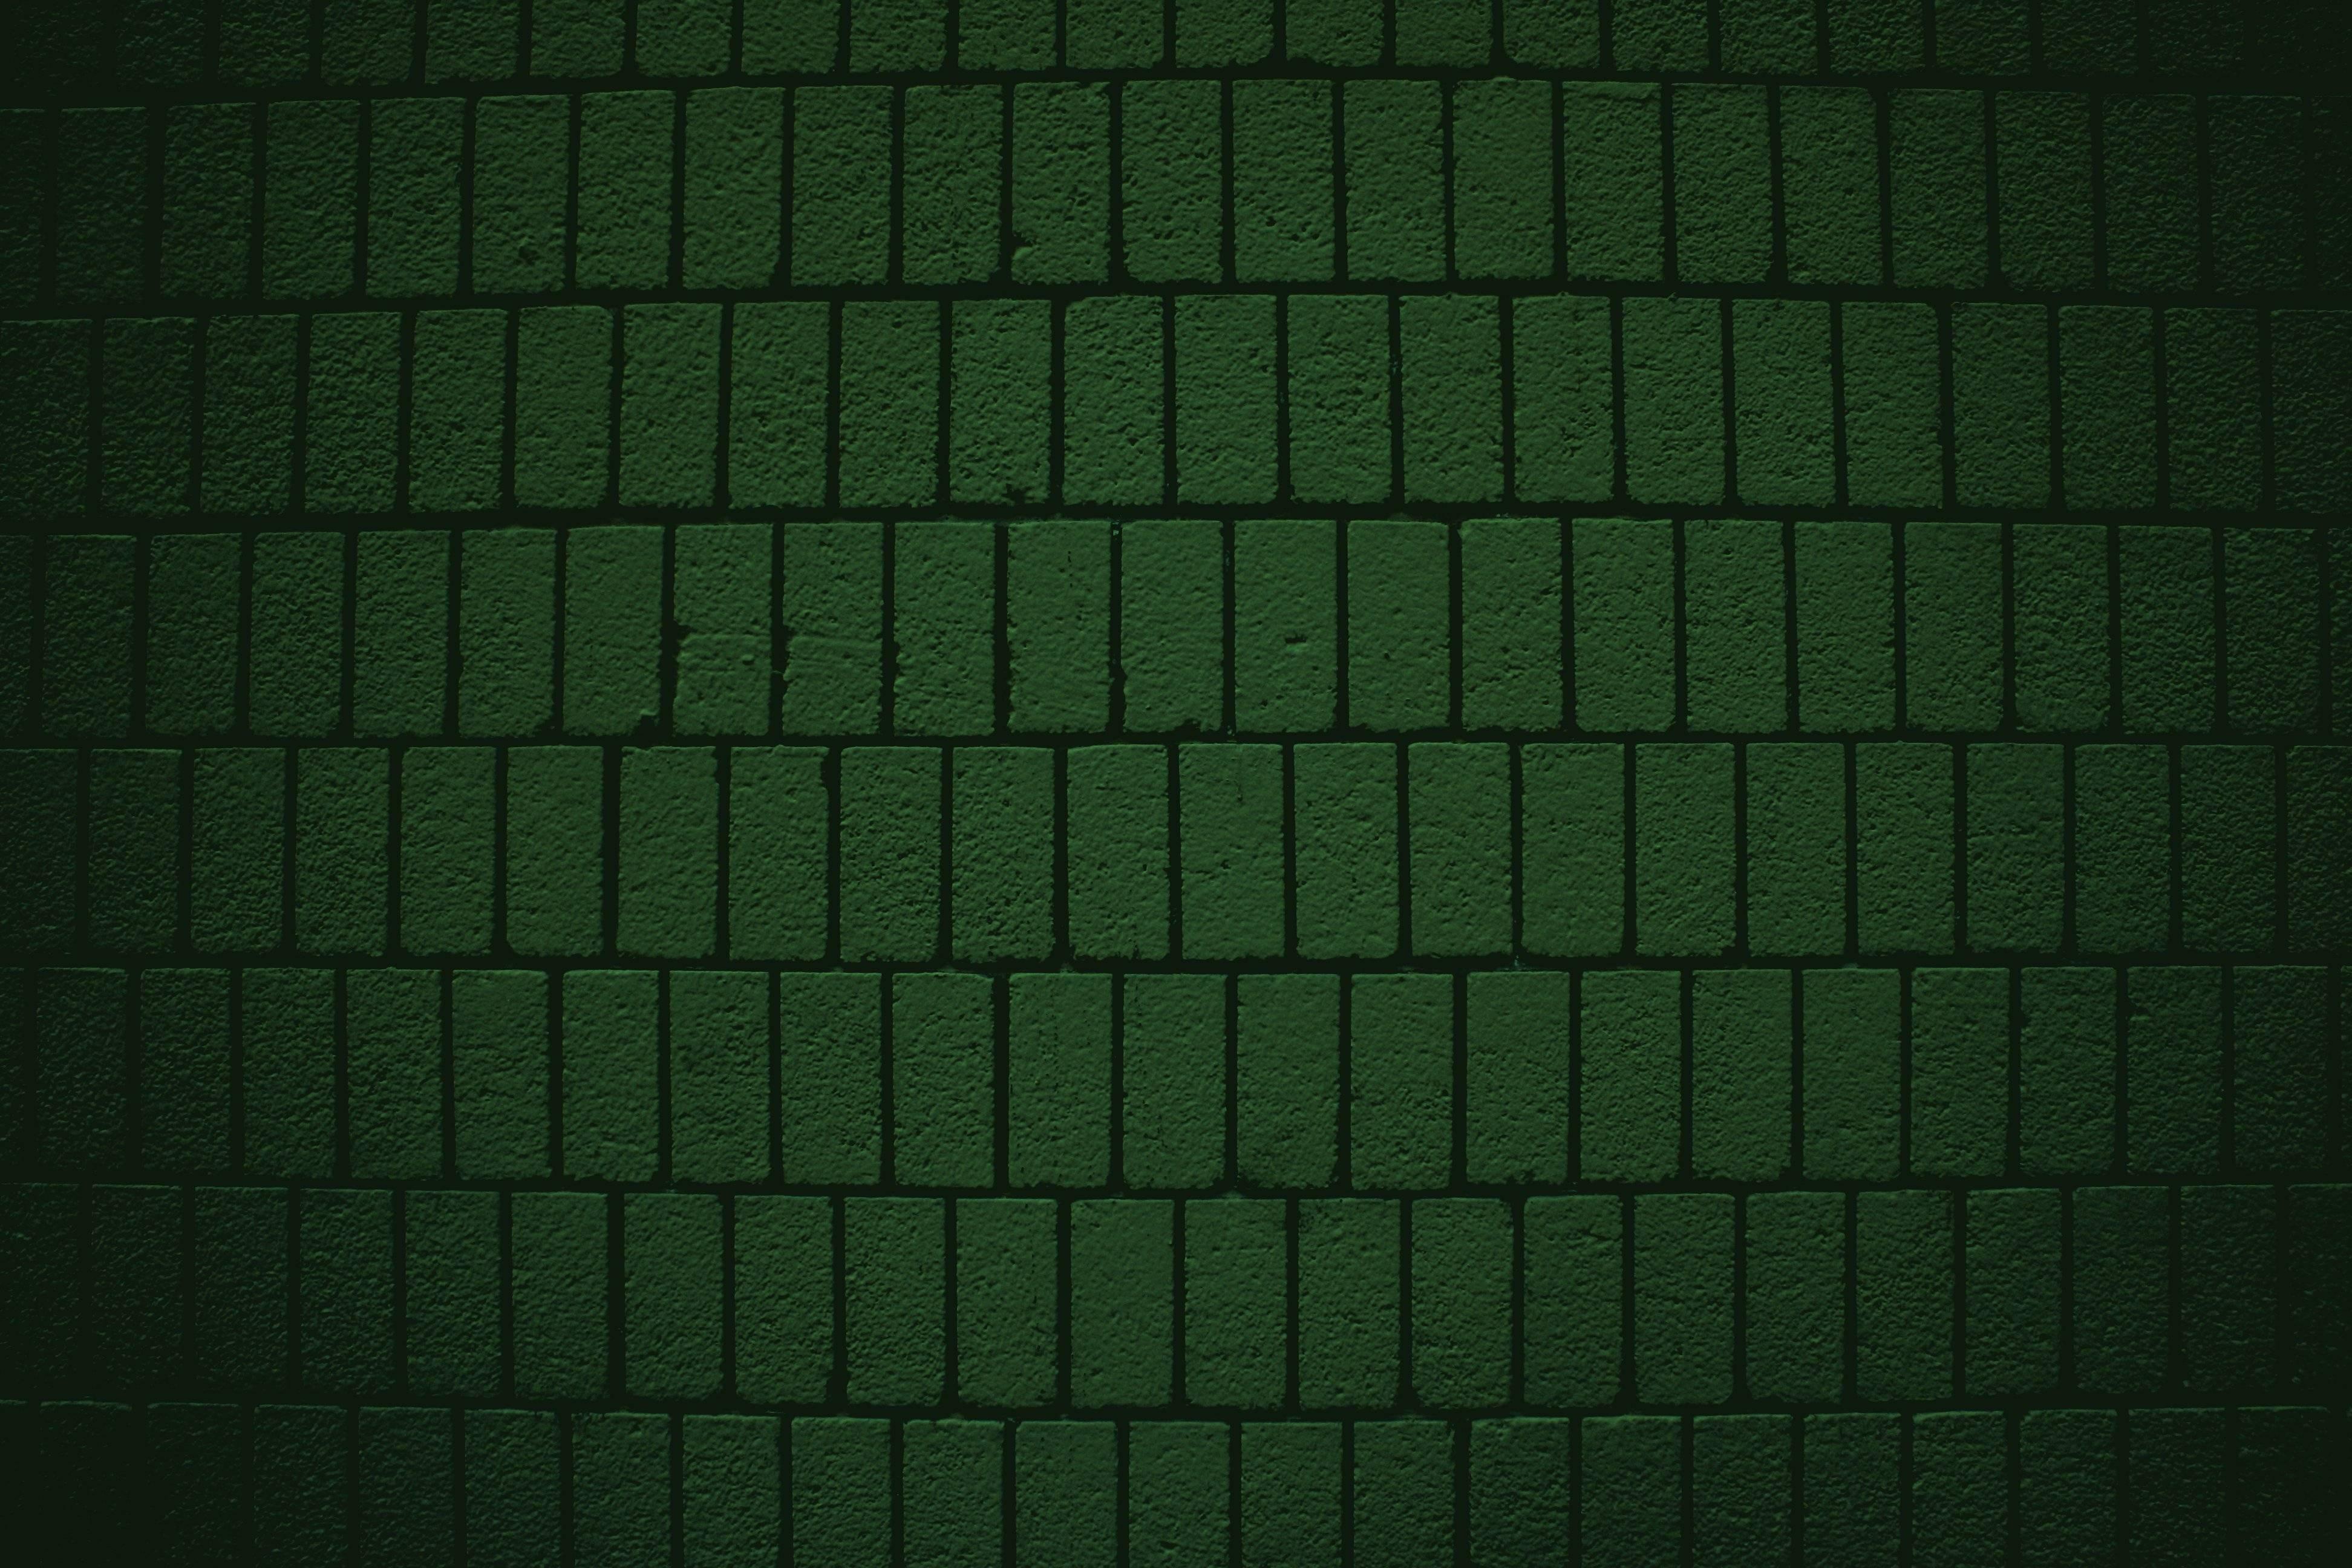 Dark green clipart hd.